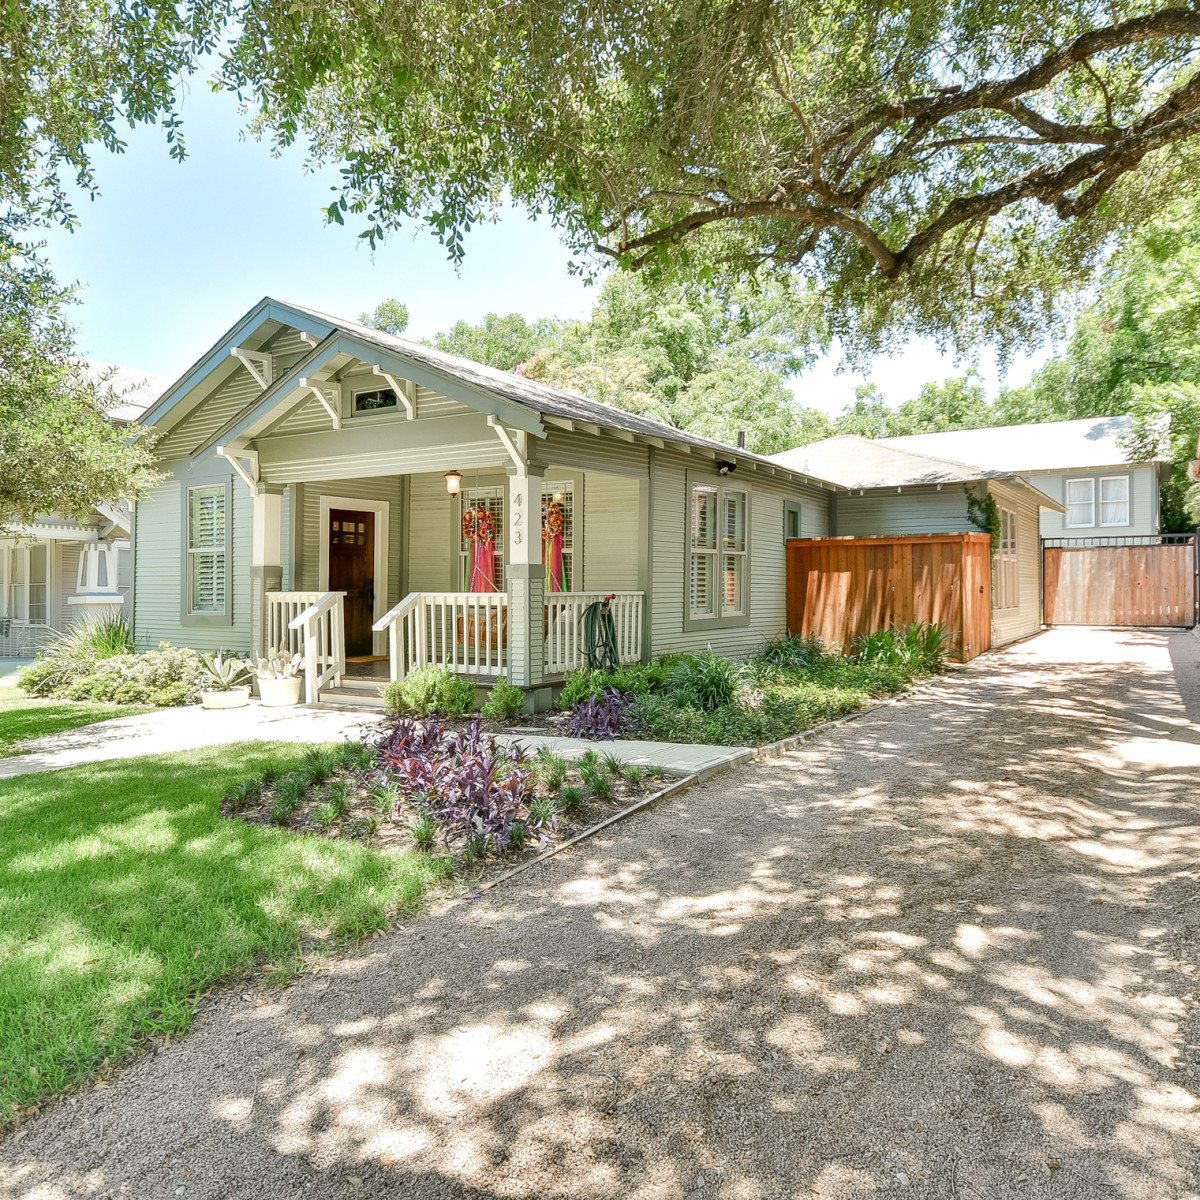 423 Queen Anne San Antonio house for sale